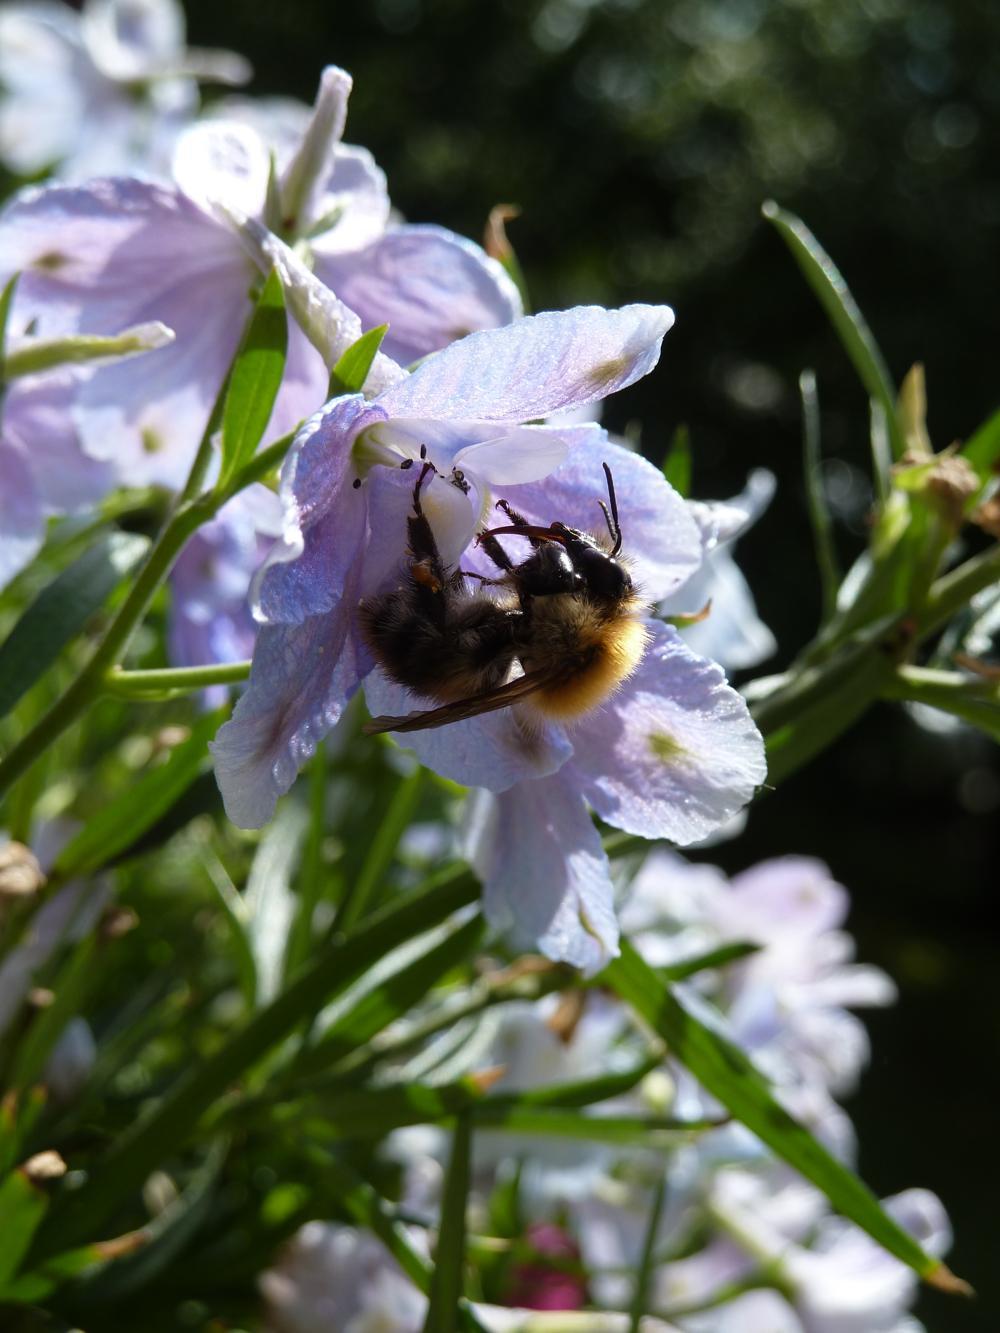 Ackerhummel in Campanula-Blüte (Glockenblüte)